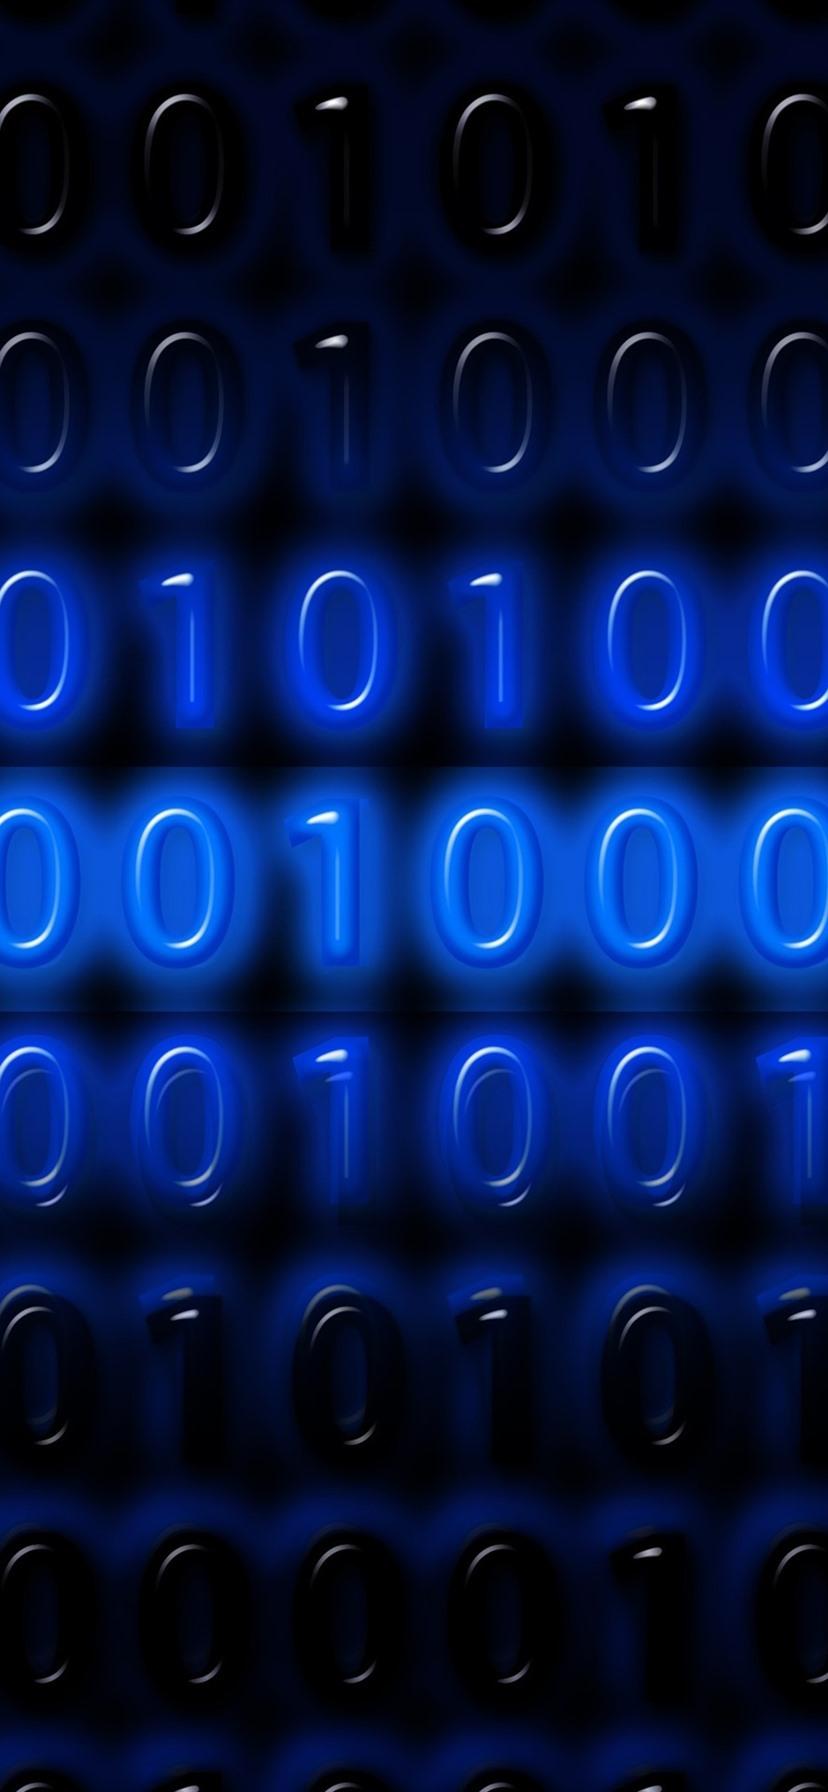 Wallpaper Binary Code Numbers One Or Zero Blue Digital